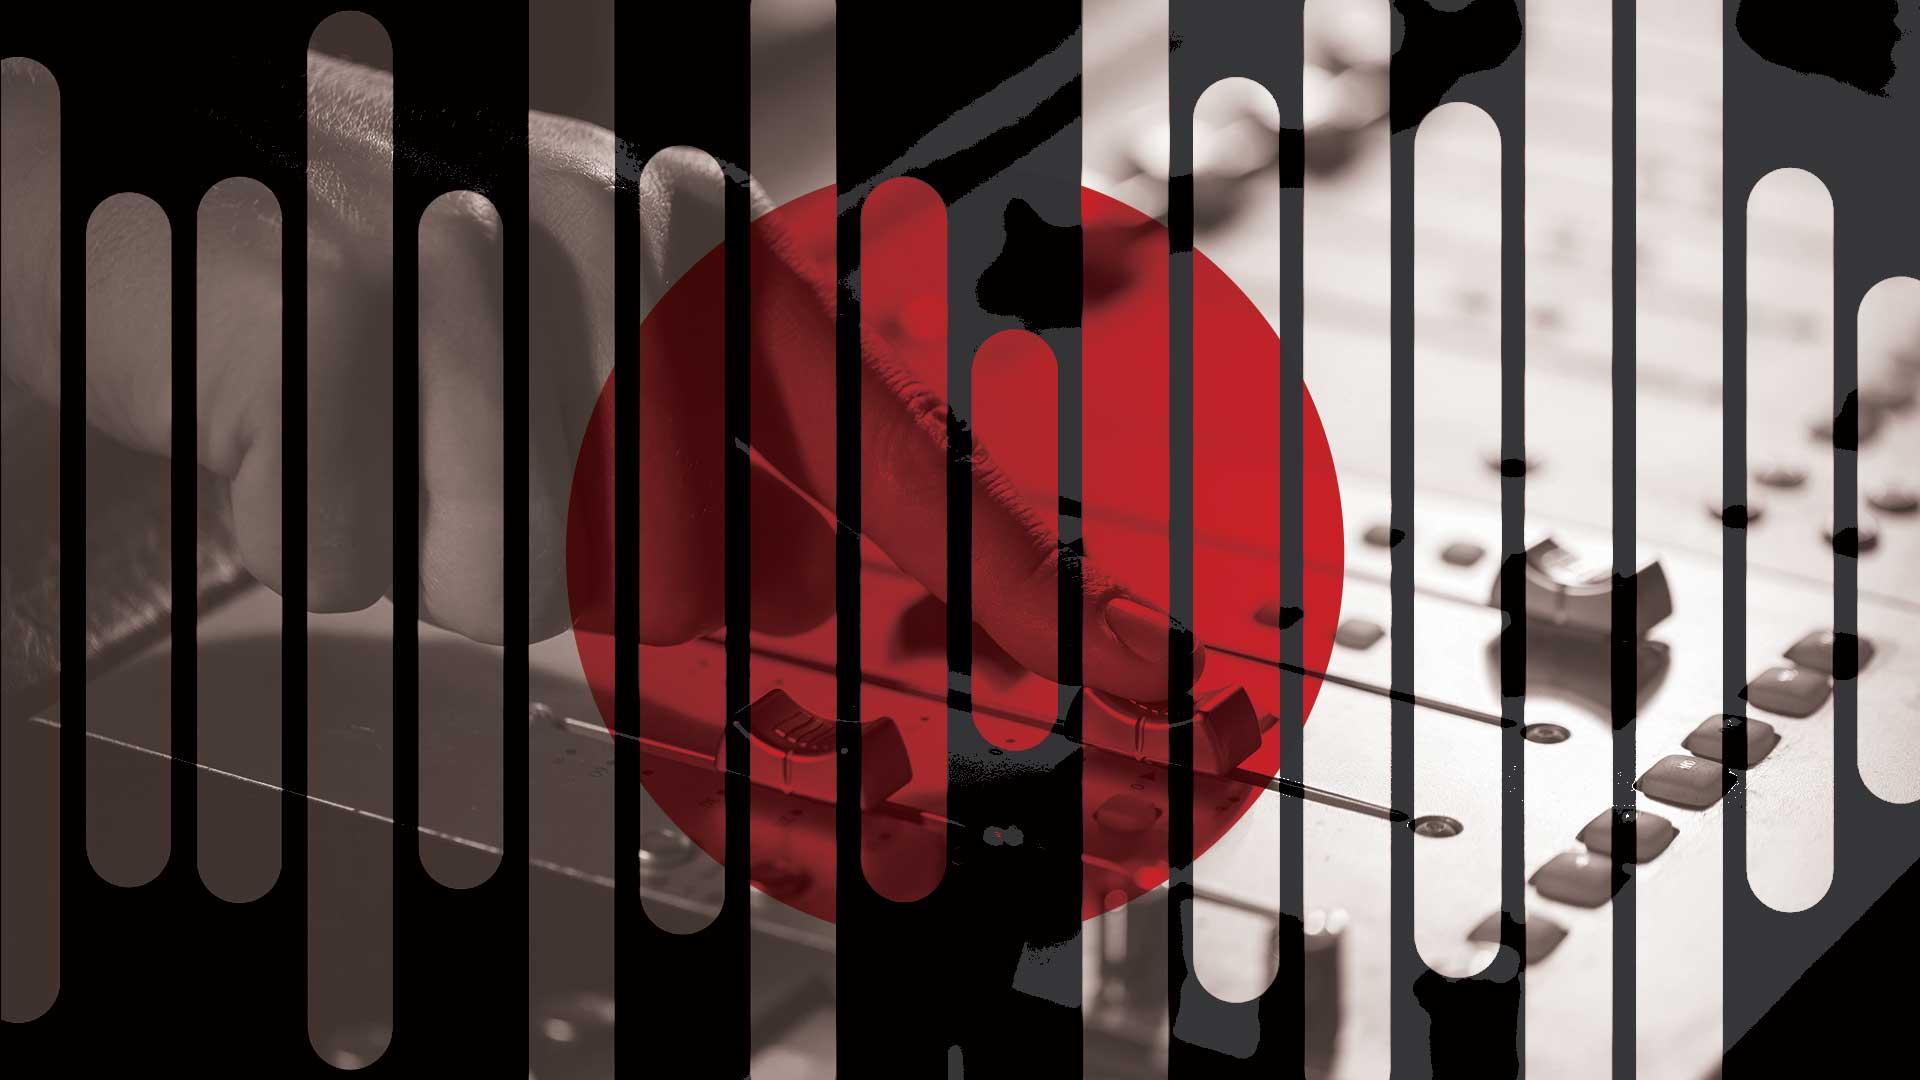 Voice-Over Services Japan - Voquent